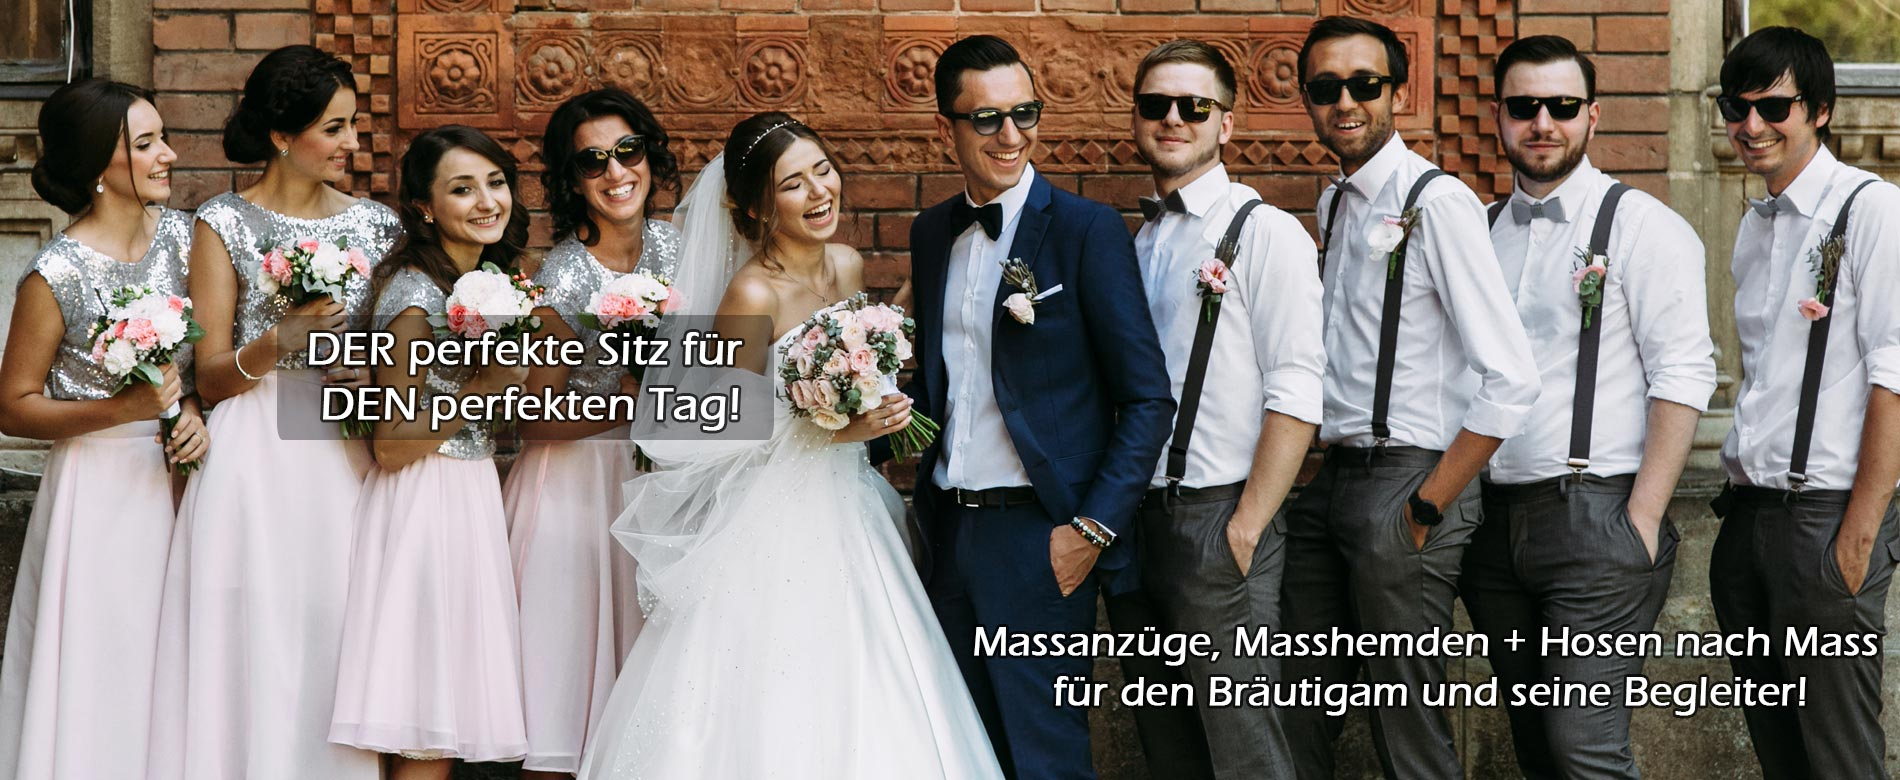 massanzug_slider_2016_2.jpg